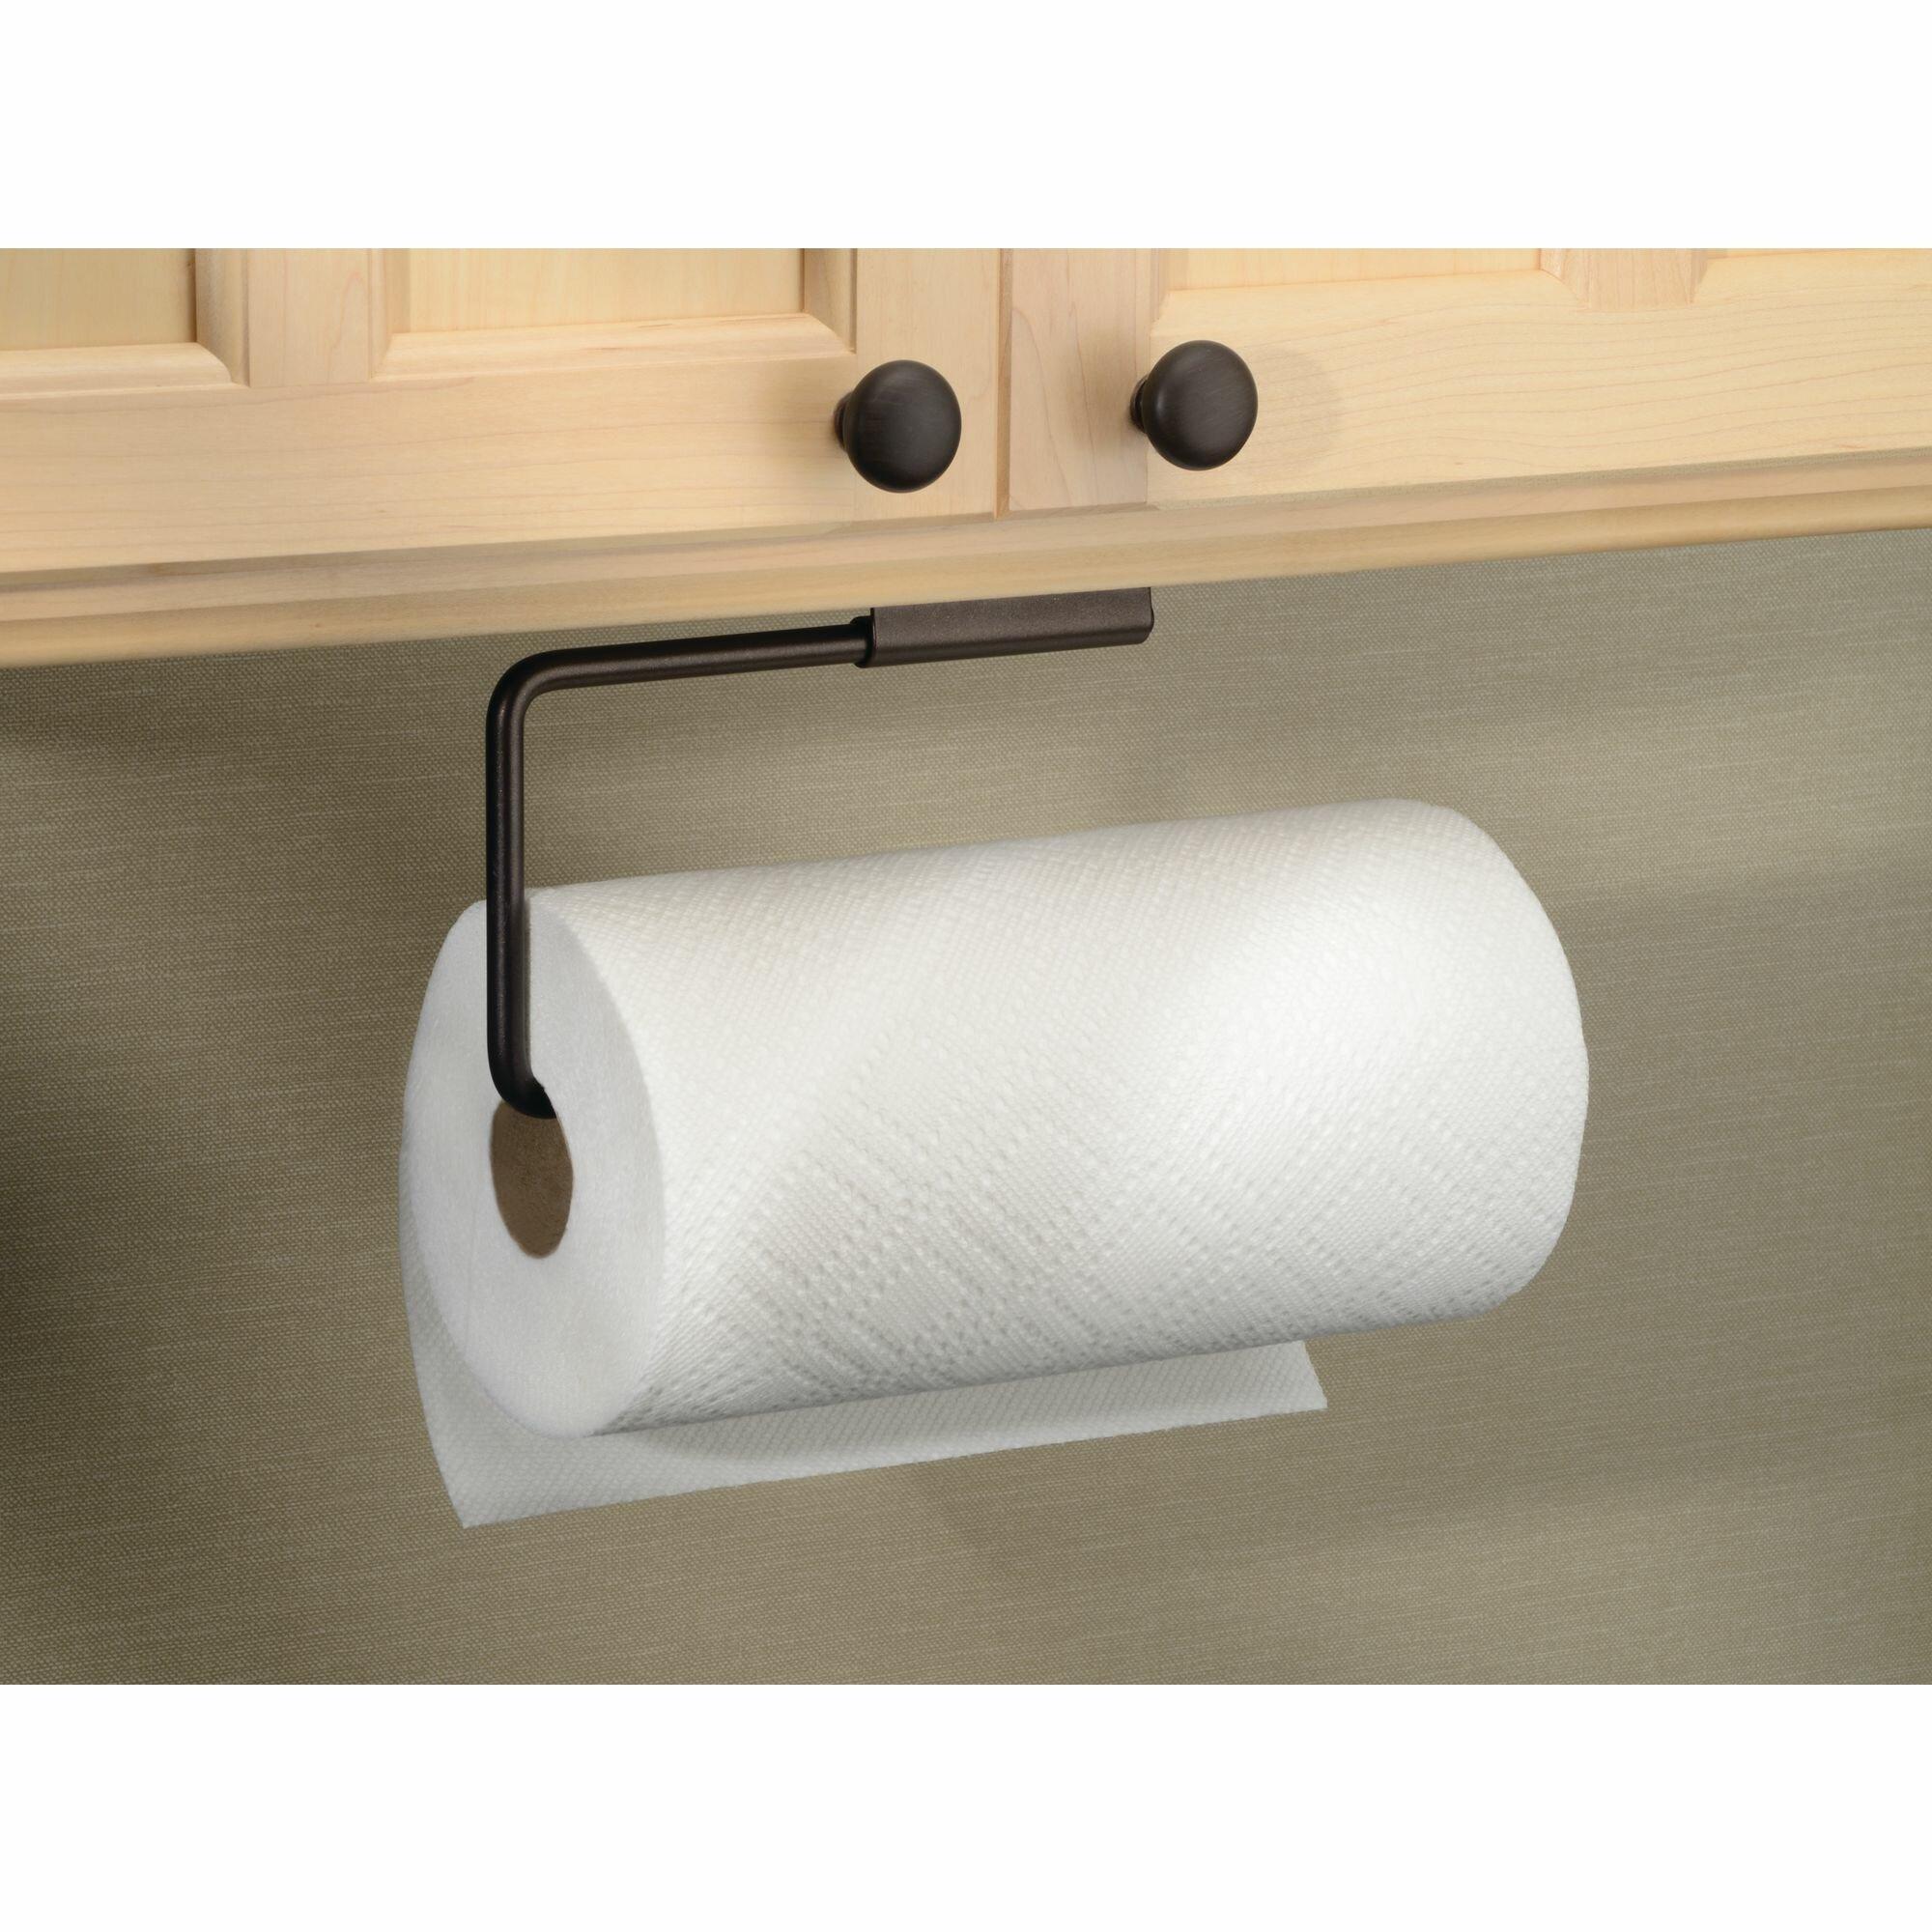 Idesign Rondo Wall Paper Towel Holder Reviews Wayfair